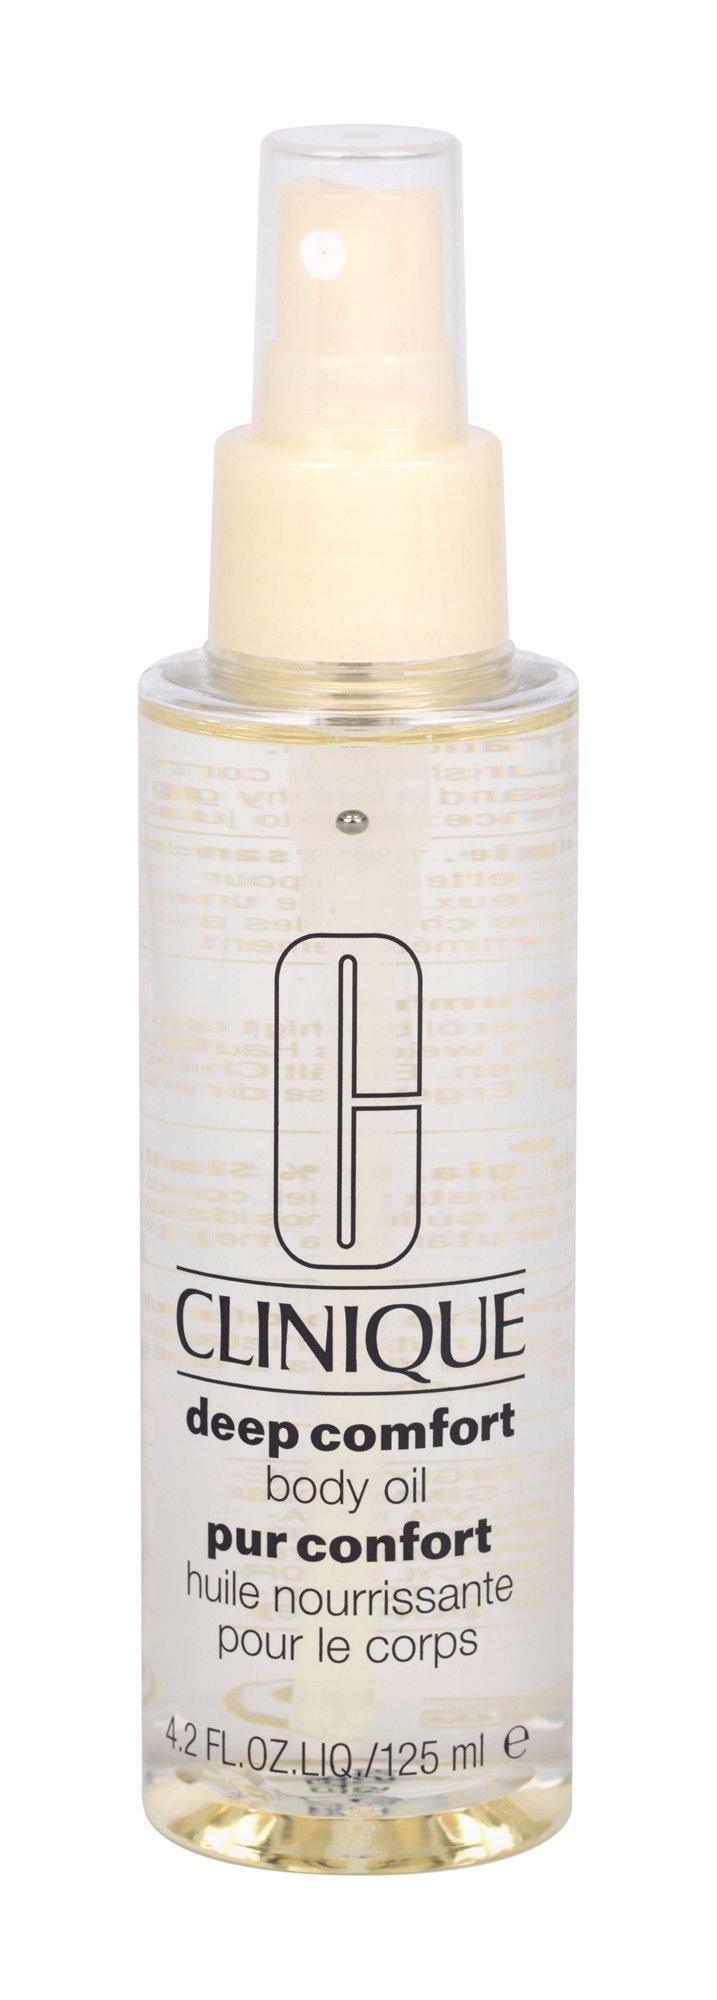 Clinique Deep Comfort Body Oil 125ml